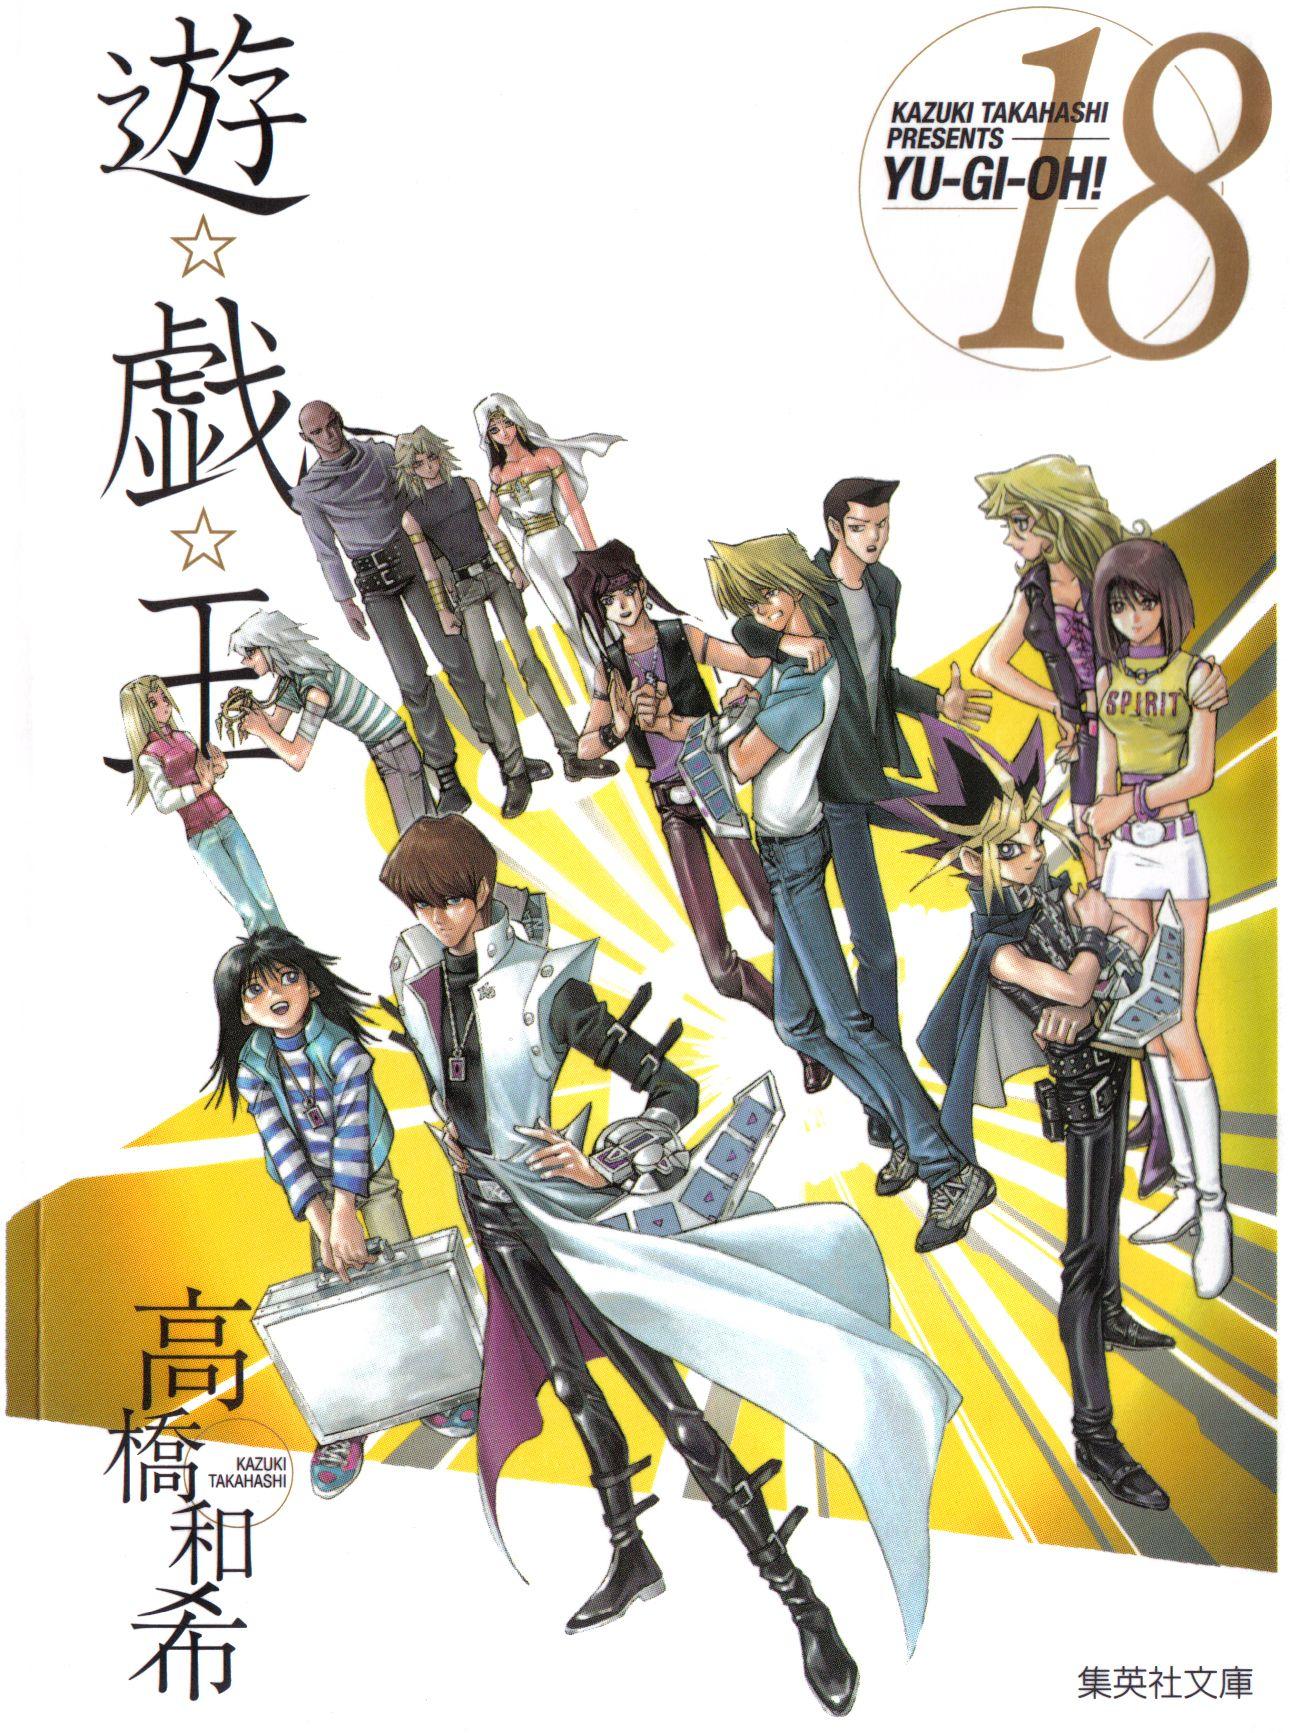 Yugioh - Atem, Team, Joey, Tristan, Mai, Kaiba, Mokuba